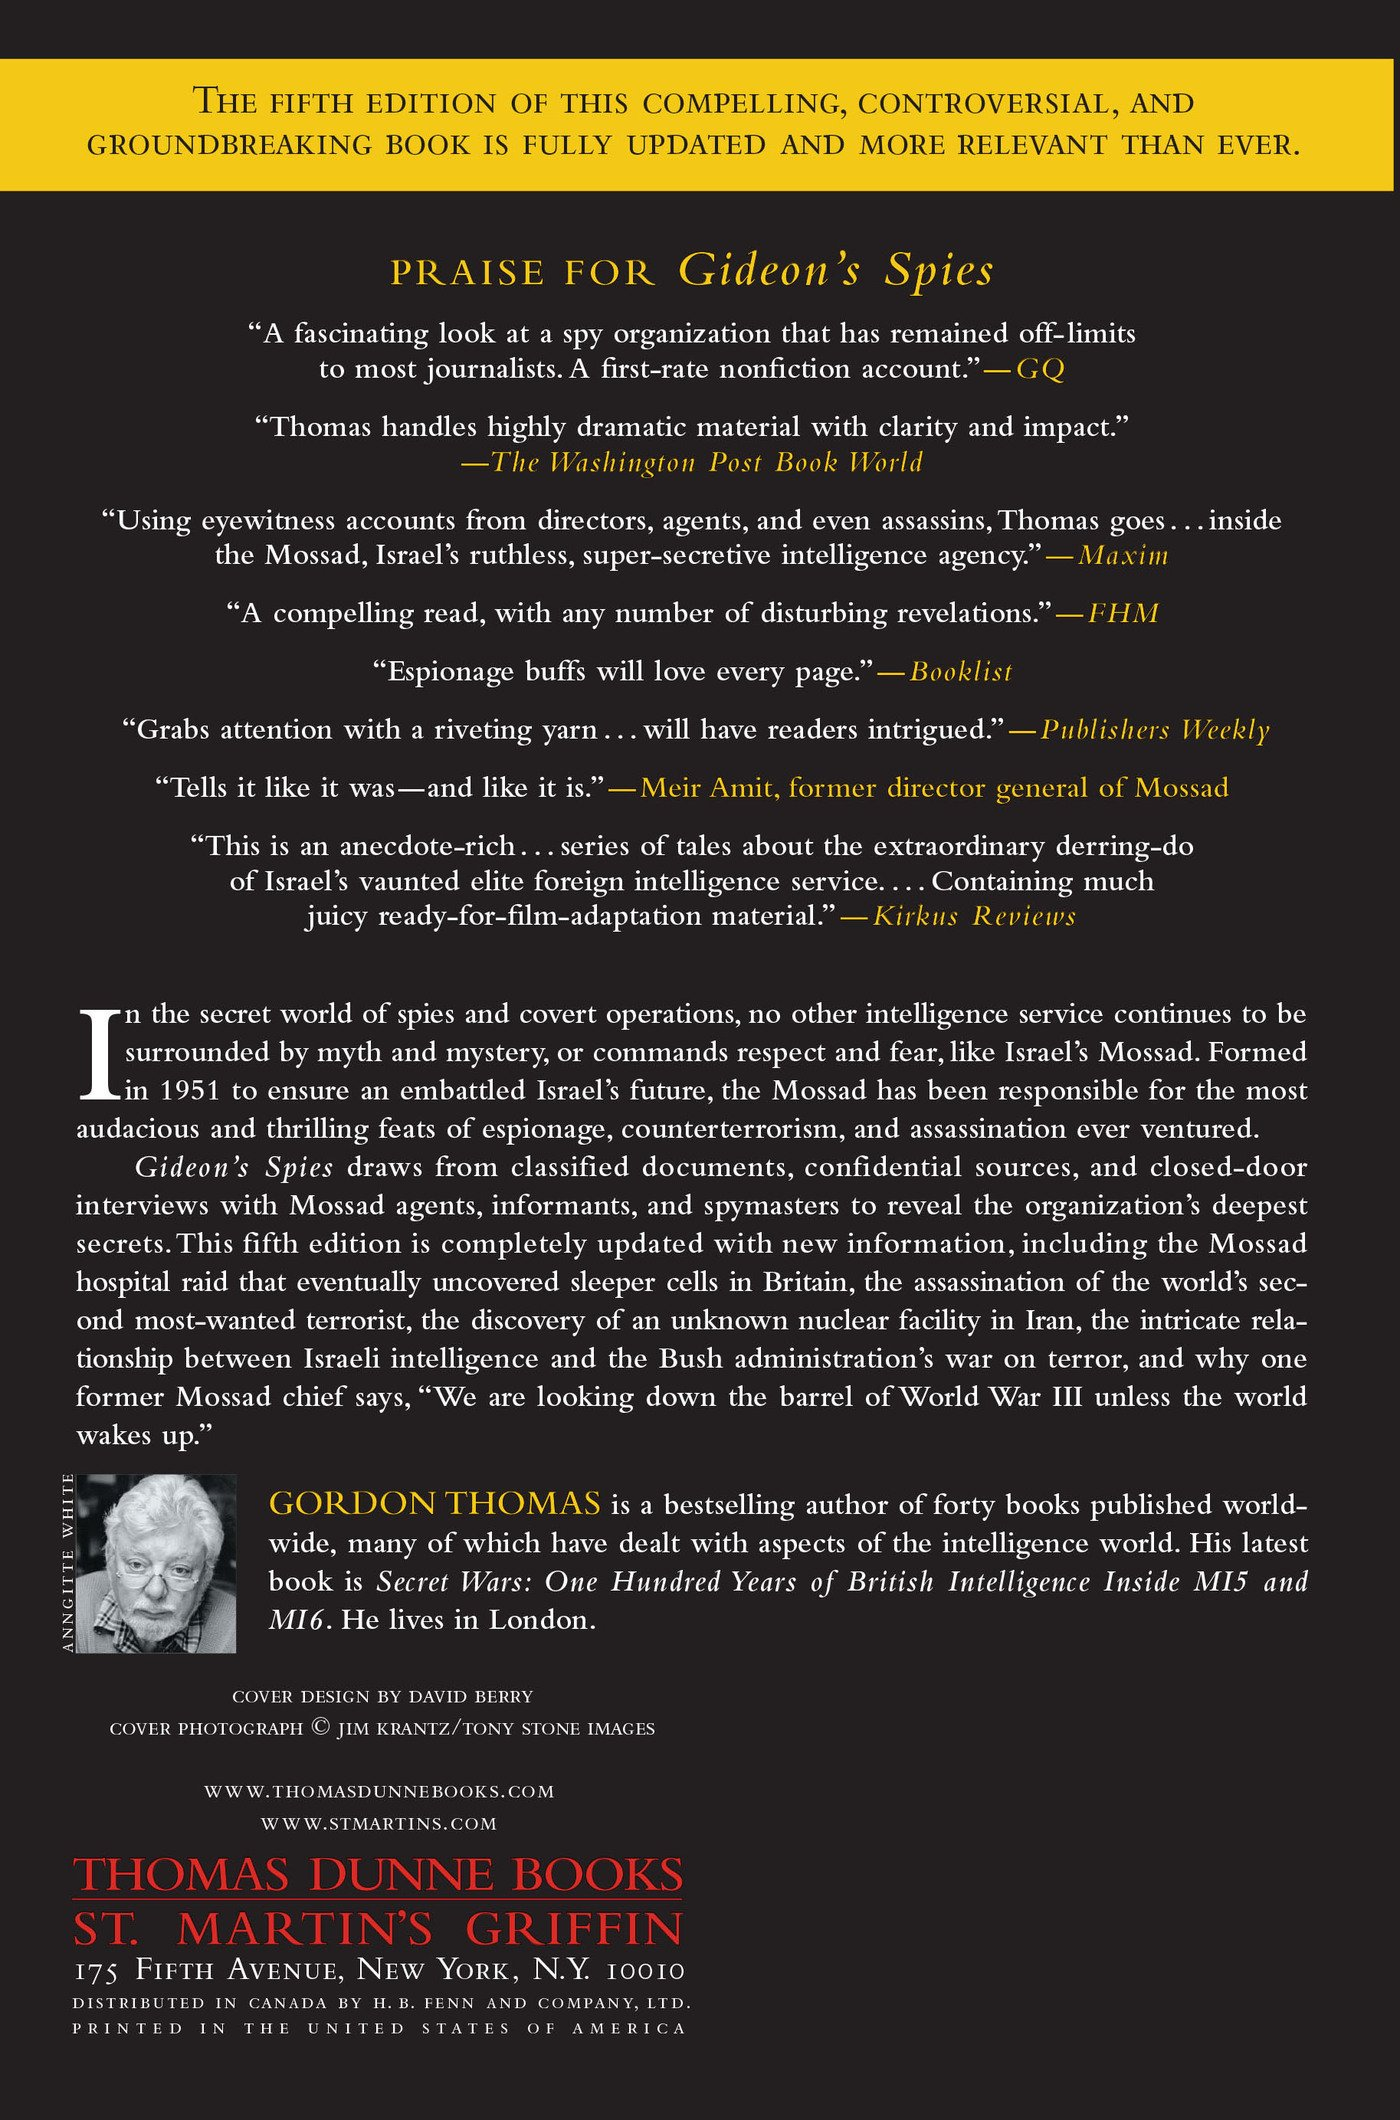 Gideon's Spies: The Secret History of the Mossad: Gordon Thomas:  9780312539016: Amazon.com: Books